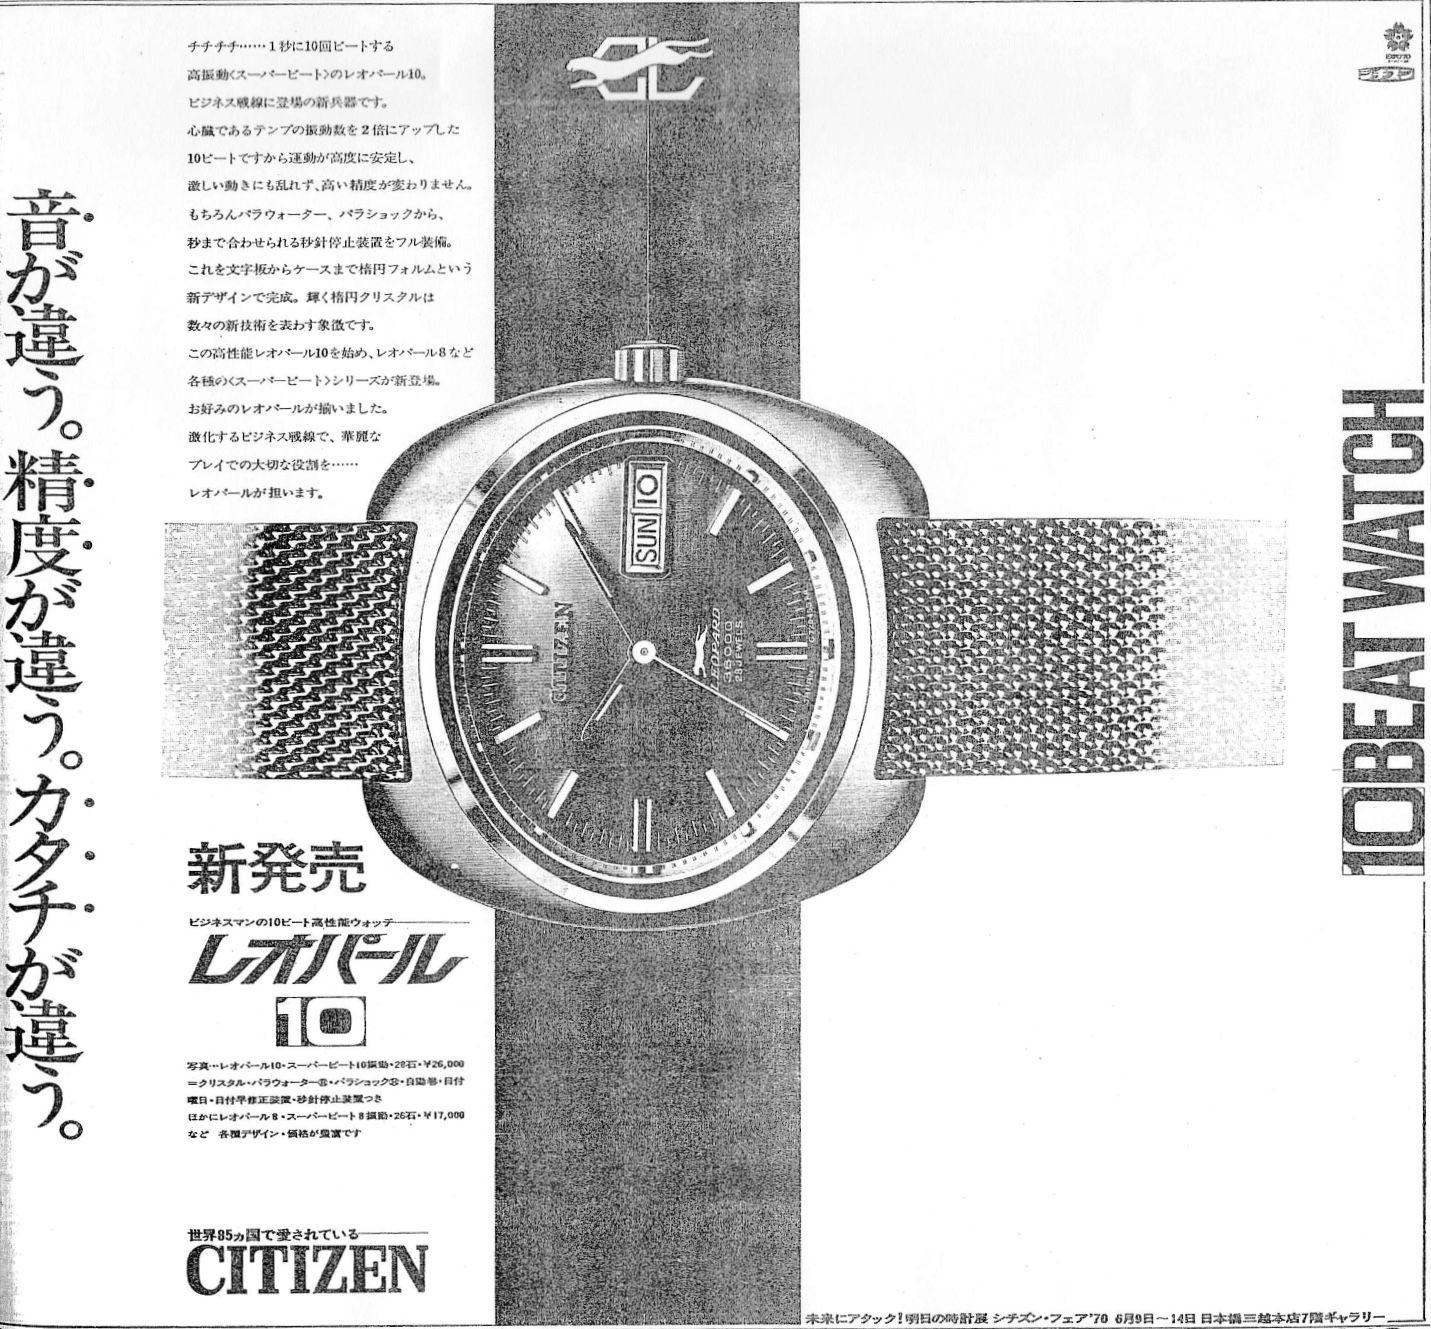 df3363fbcf シチズン CITIZEN レオパール10 LEOPARD 10BEATWATCH 新発売 広告 1970 クールな時計, マイケル・